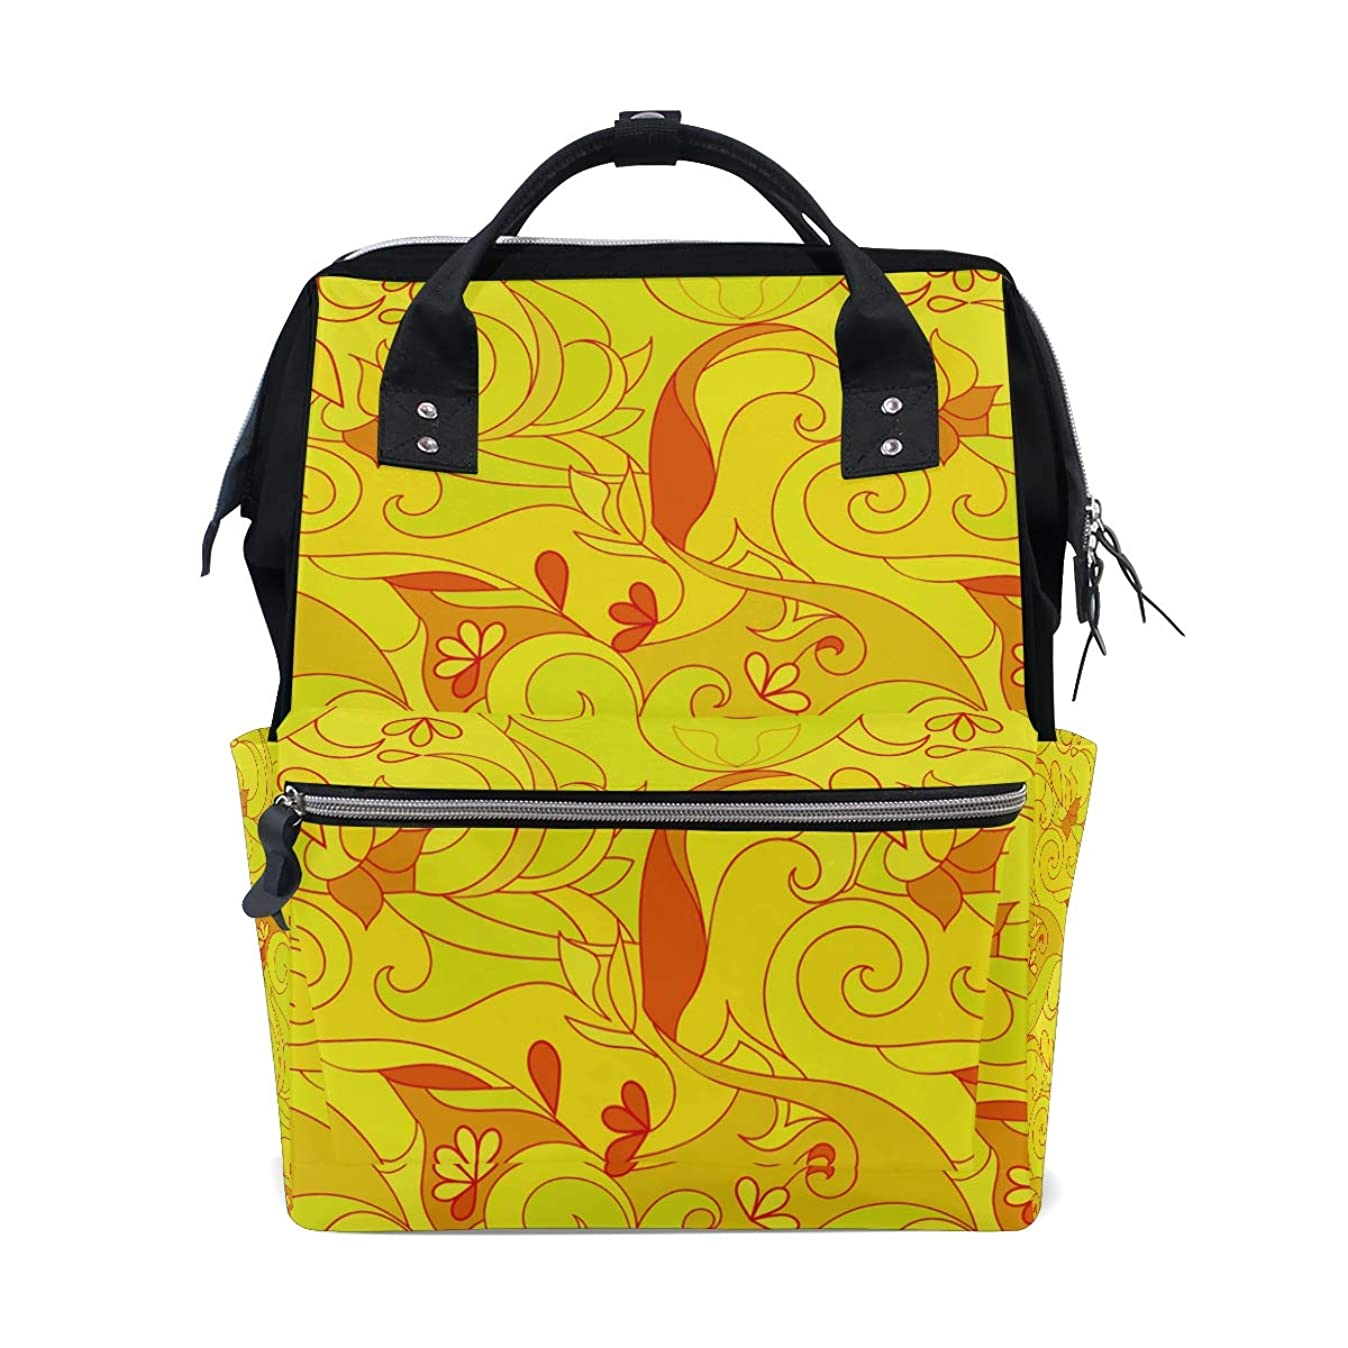 Yellow Abstract Pattern School Backpack Large Capacity Mummy Bags Laptop Handbag Casual Travel Rucksack Satchel For Women Men Adult Teen Children z2853110616